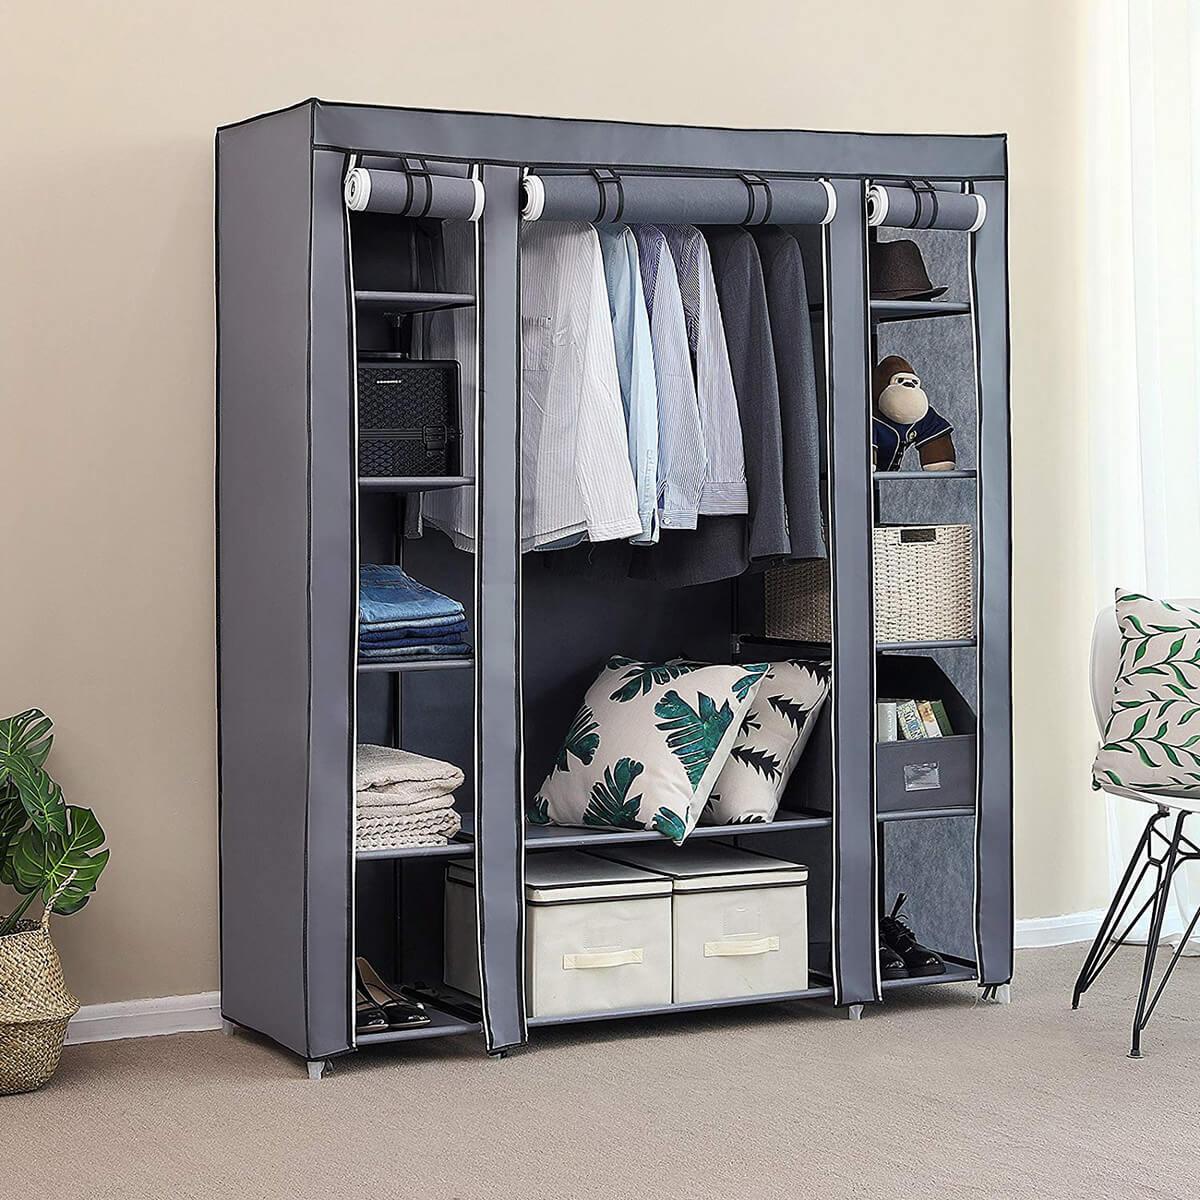 59 Inch Portable Closet Organizer